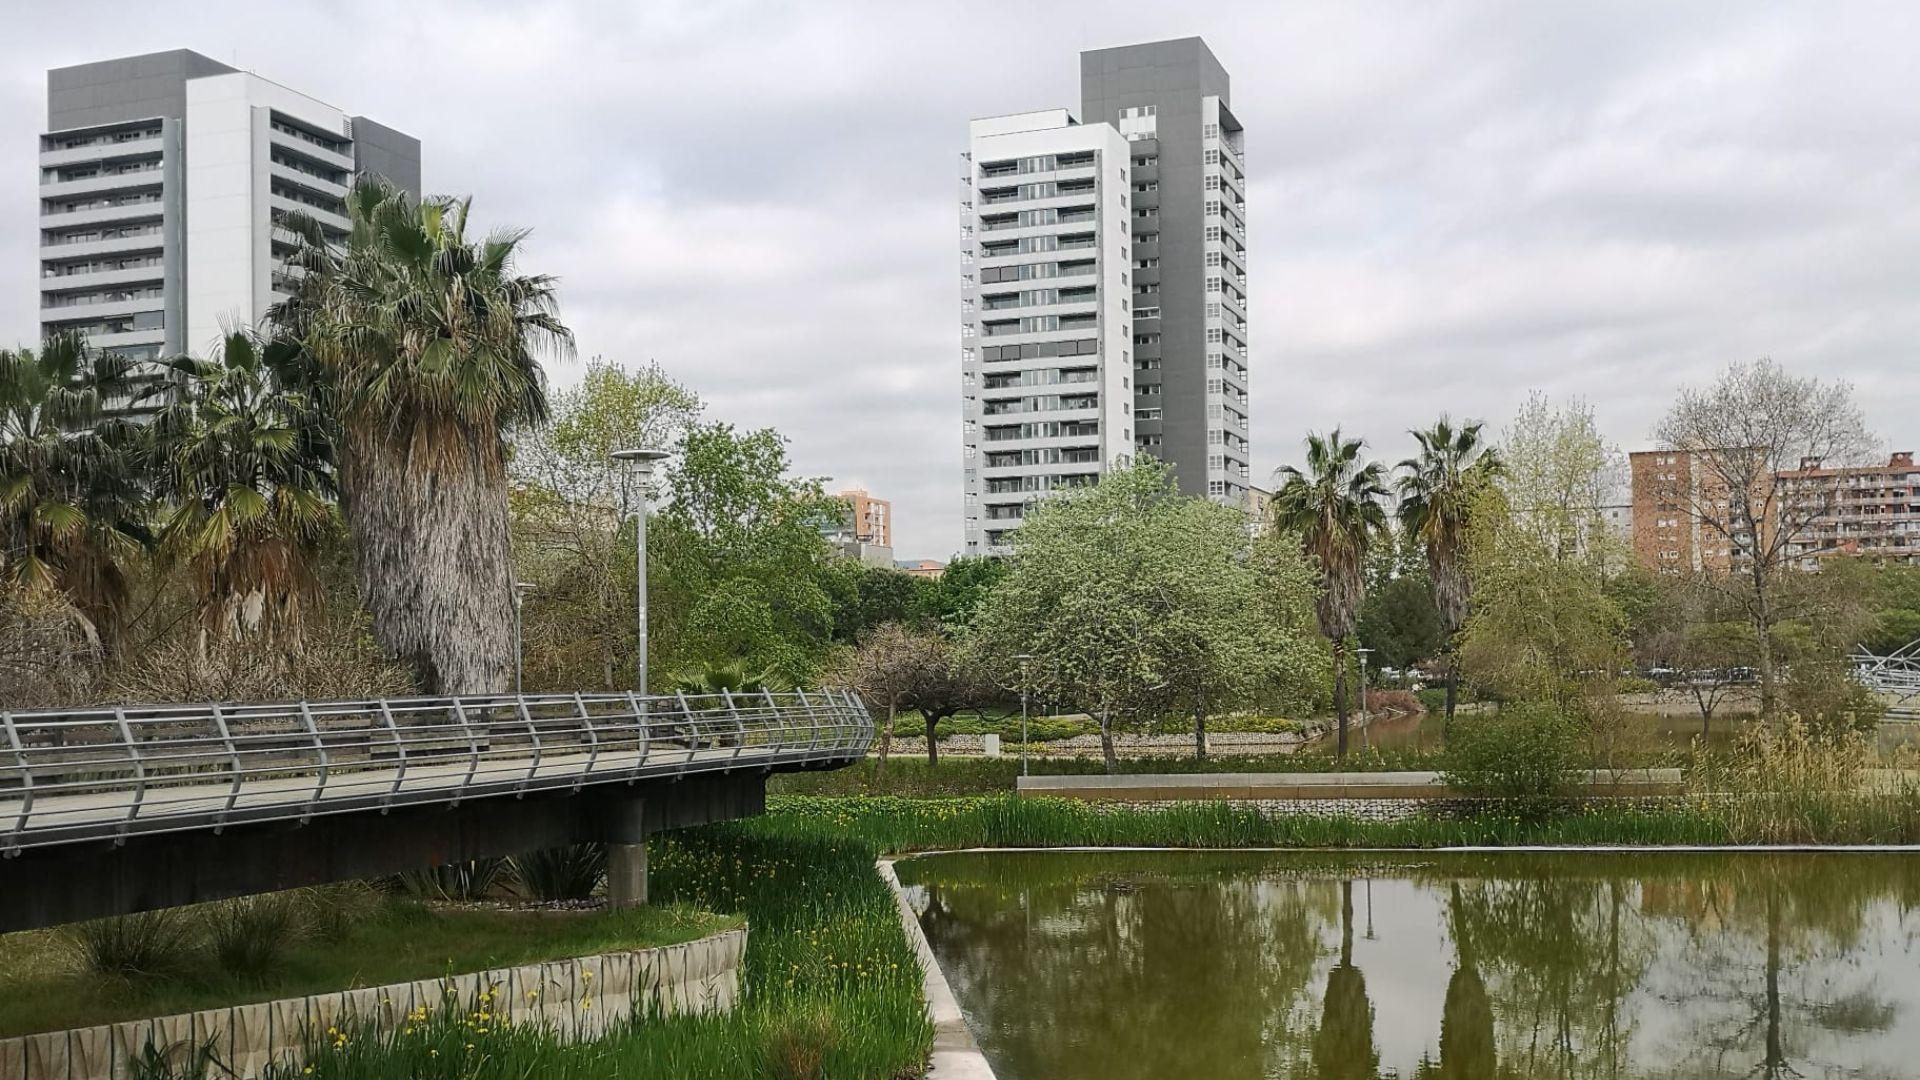 refugi biodiversitat parc diagonal mar